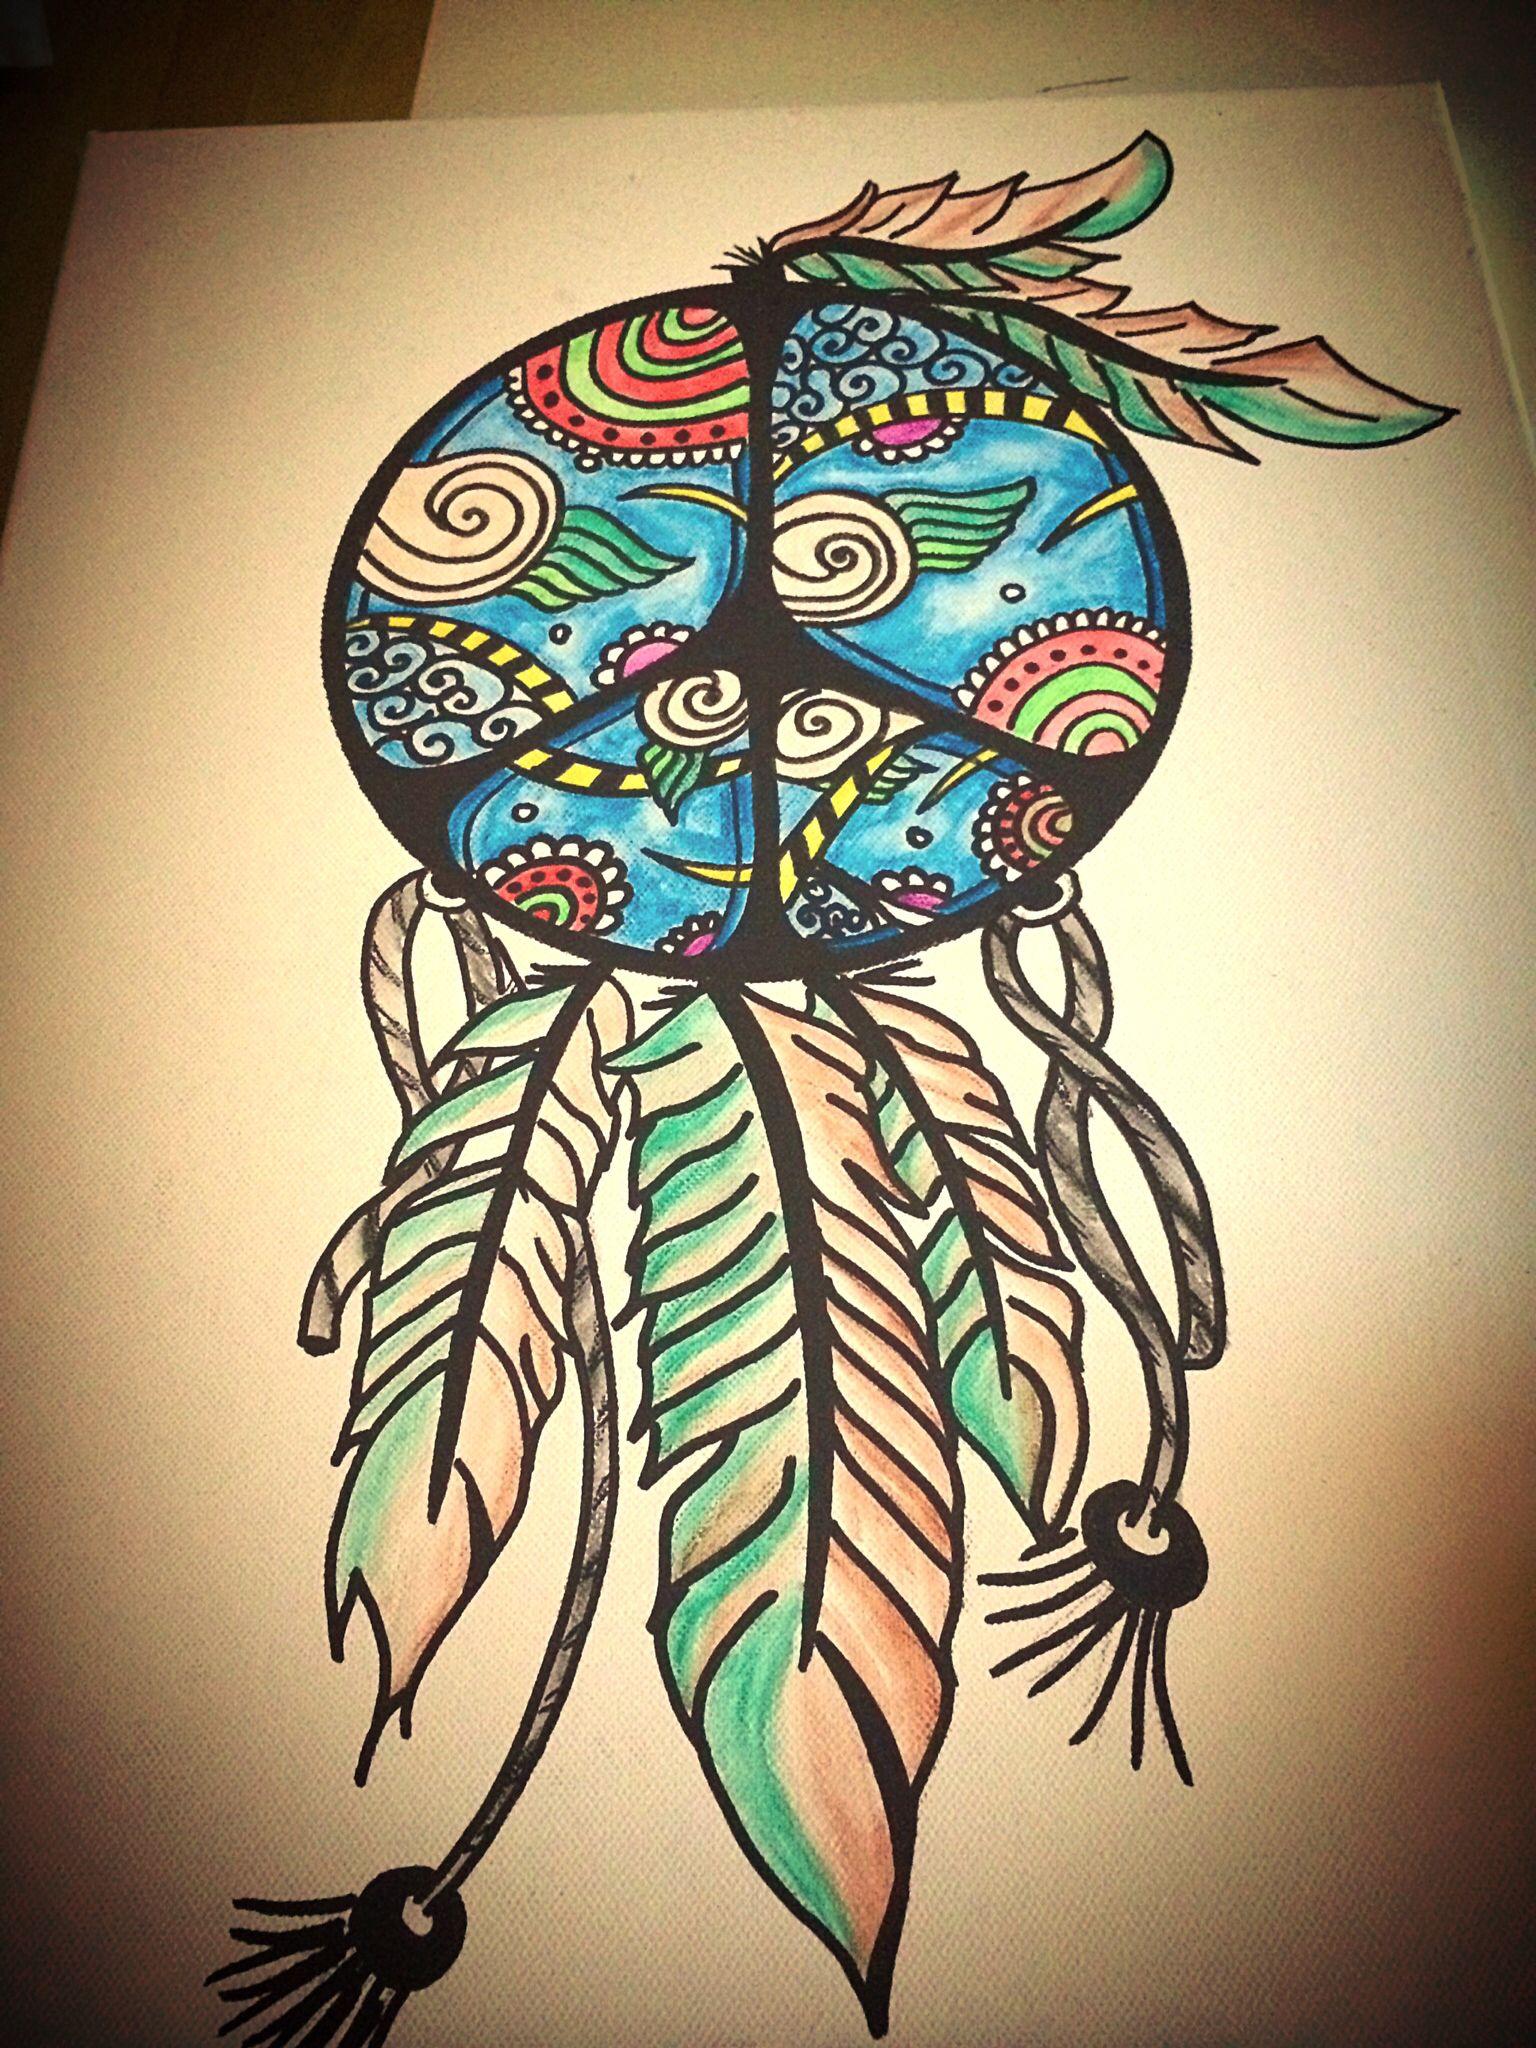 Finished It Tonight bohemian draw doodling